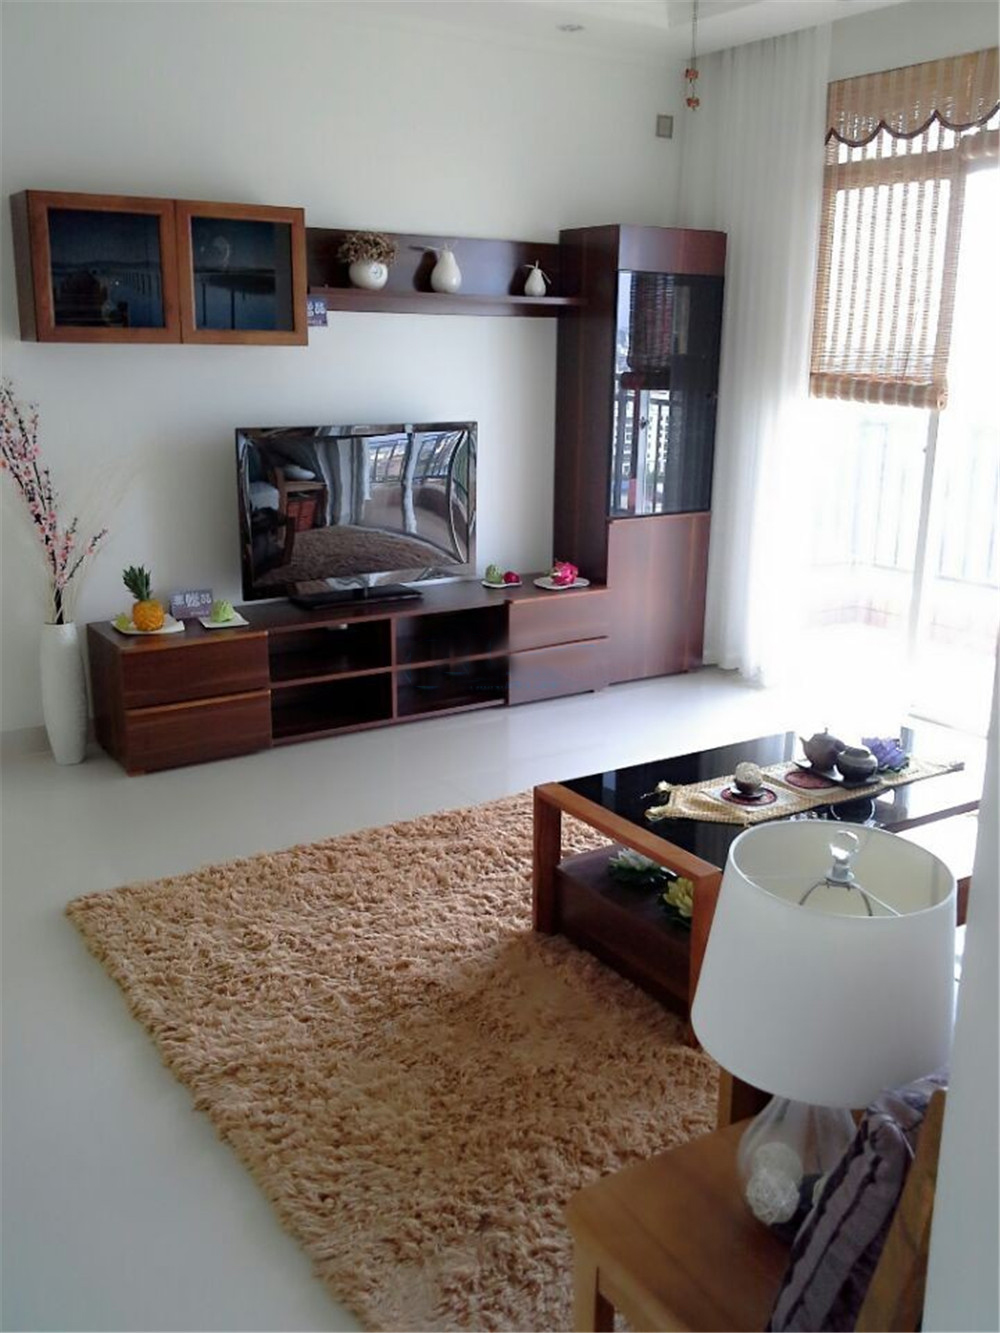 http://yuefangwangimg.oss-cn-hangzhou.aliyuncs.com/uploads/20200404/fe8ba8e3459399872cf37ee48aeac8beMax.jpg